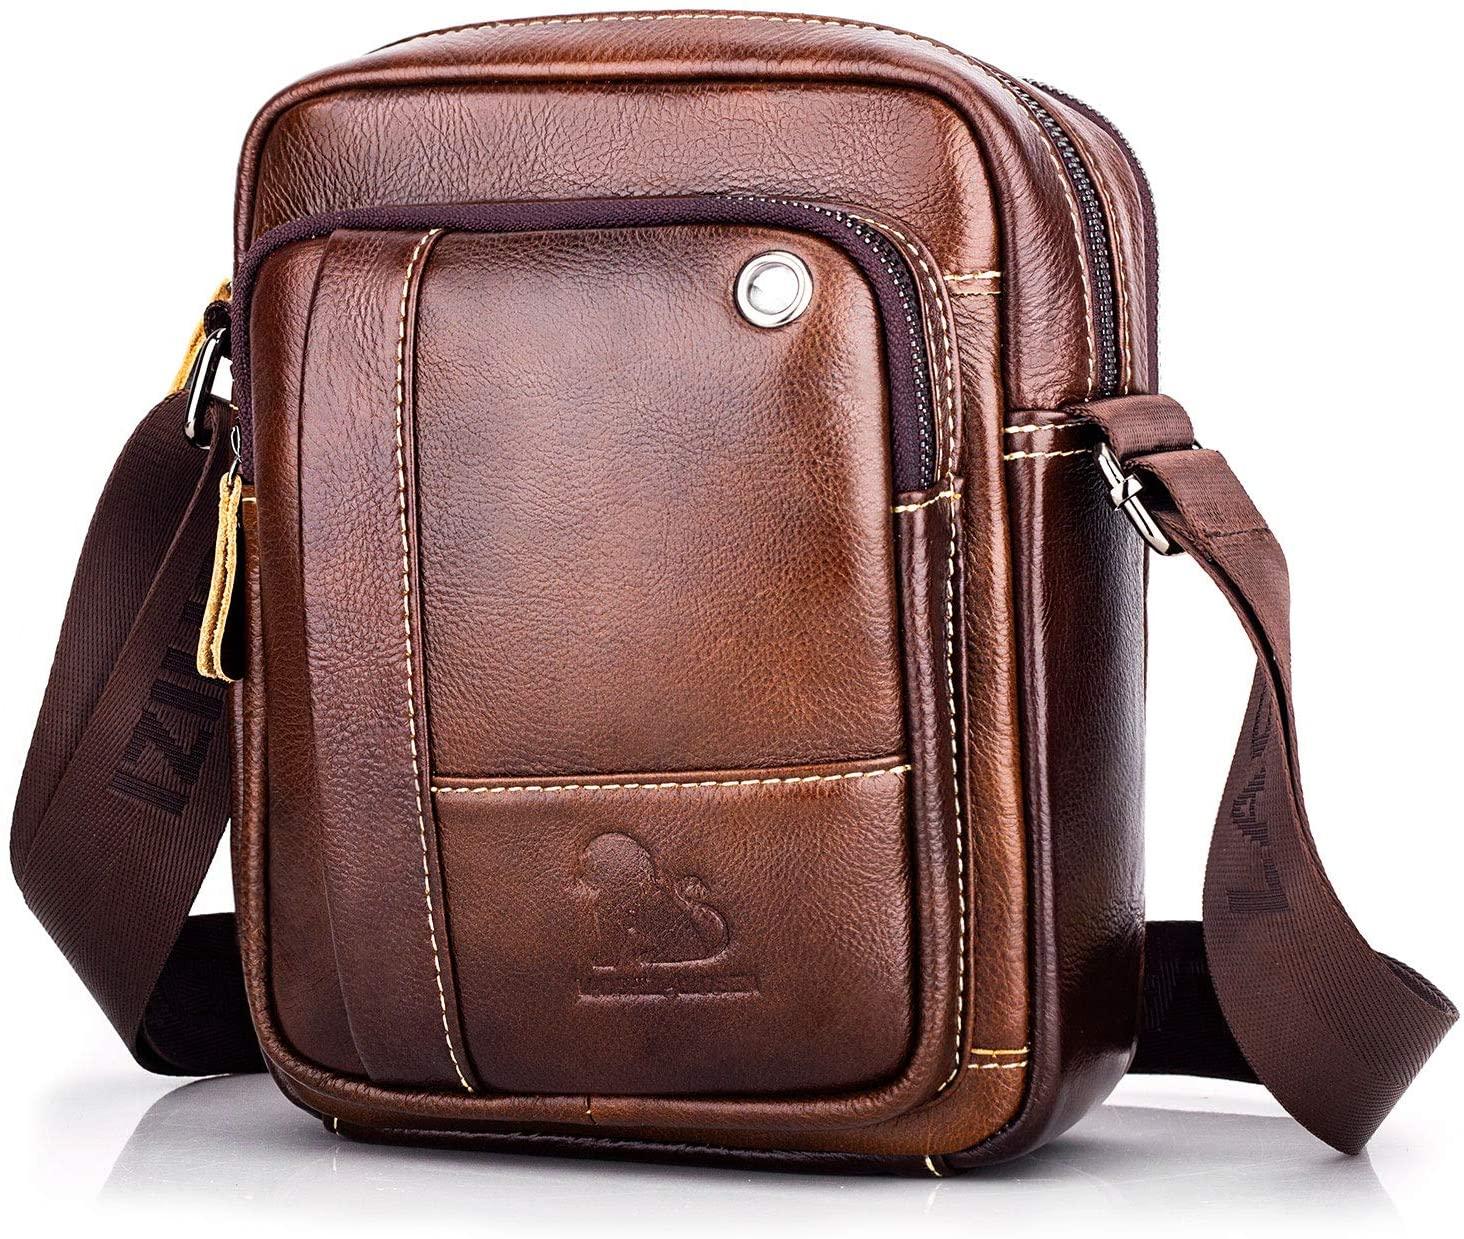 Men's Leather Cross Body Bag Casual Messenger Satchel Side Bag for Wallet Purse Mobile Phone Keys (Brown)